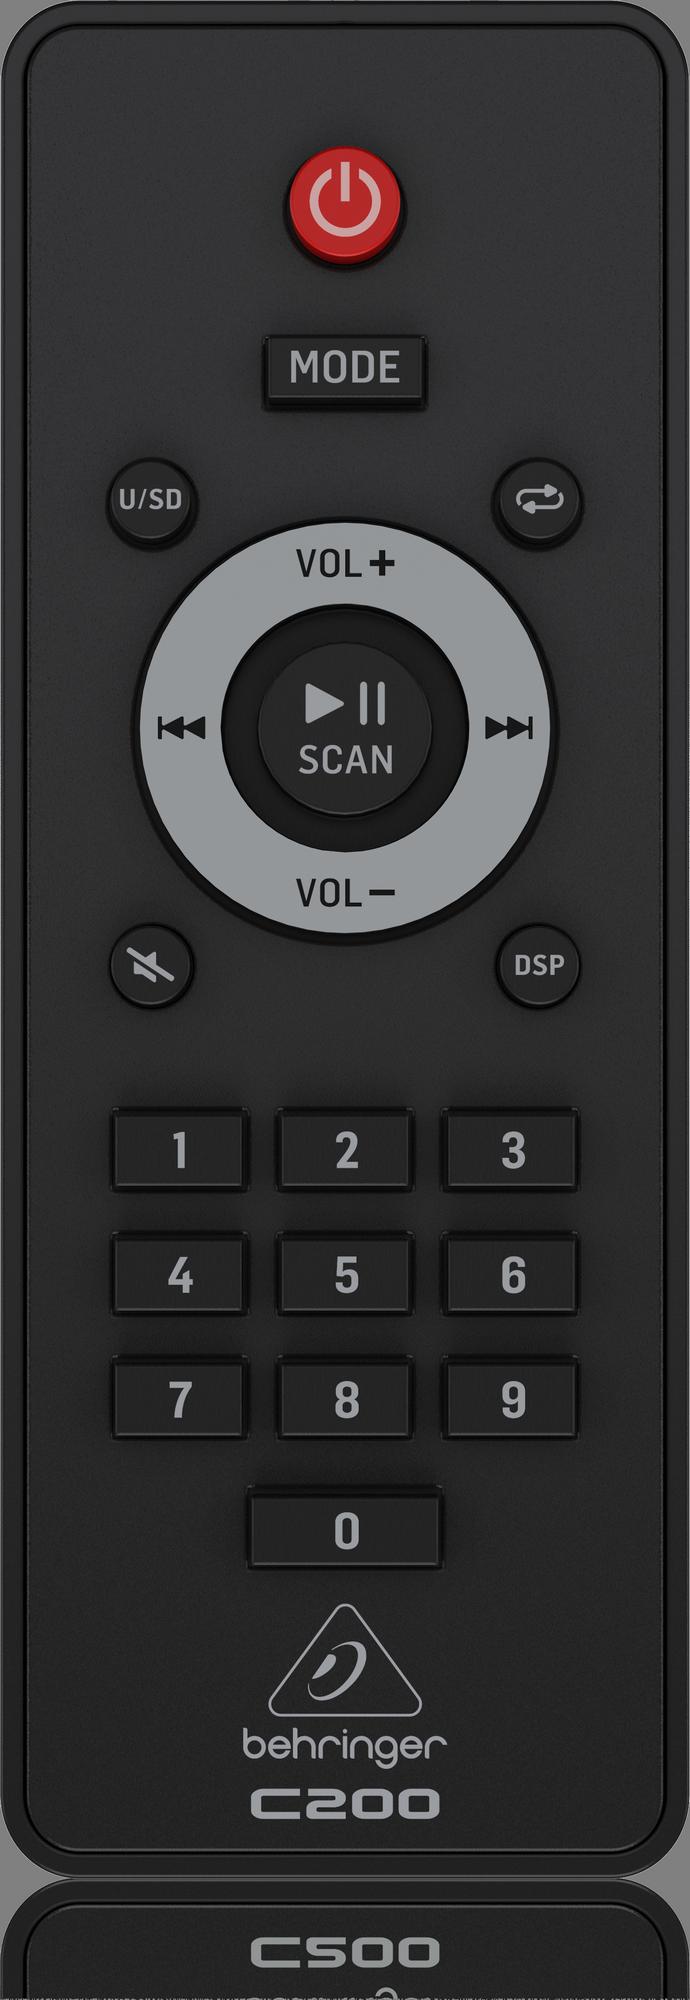 QuRRong Soporte de micr/ófono Micr/ófono Choque C3000B C4000B XLS C2000B H-85 Monte Clip Soporte for AKG C414B para Podcast Gaming Color : Black, Size : M